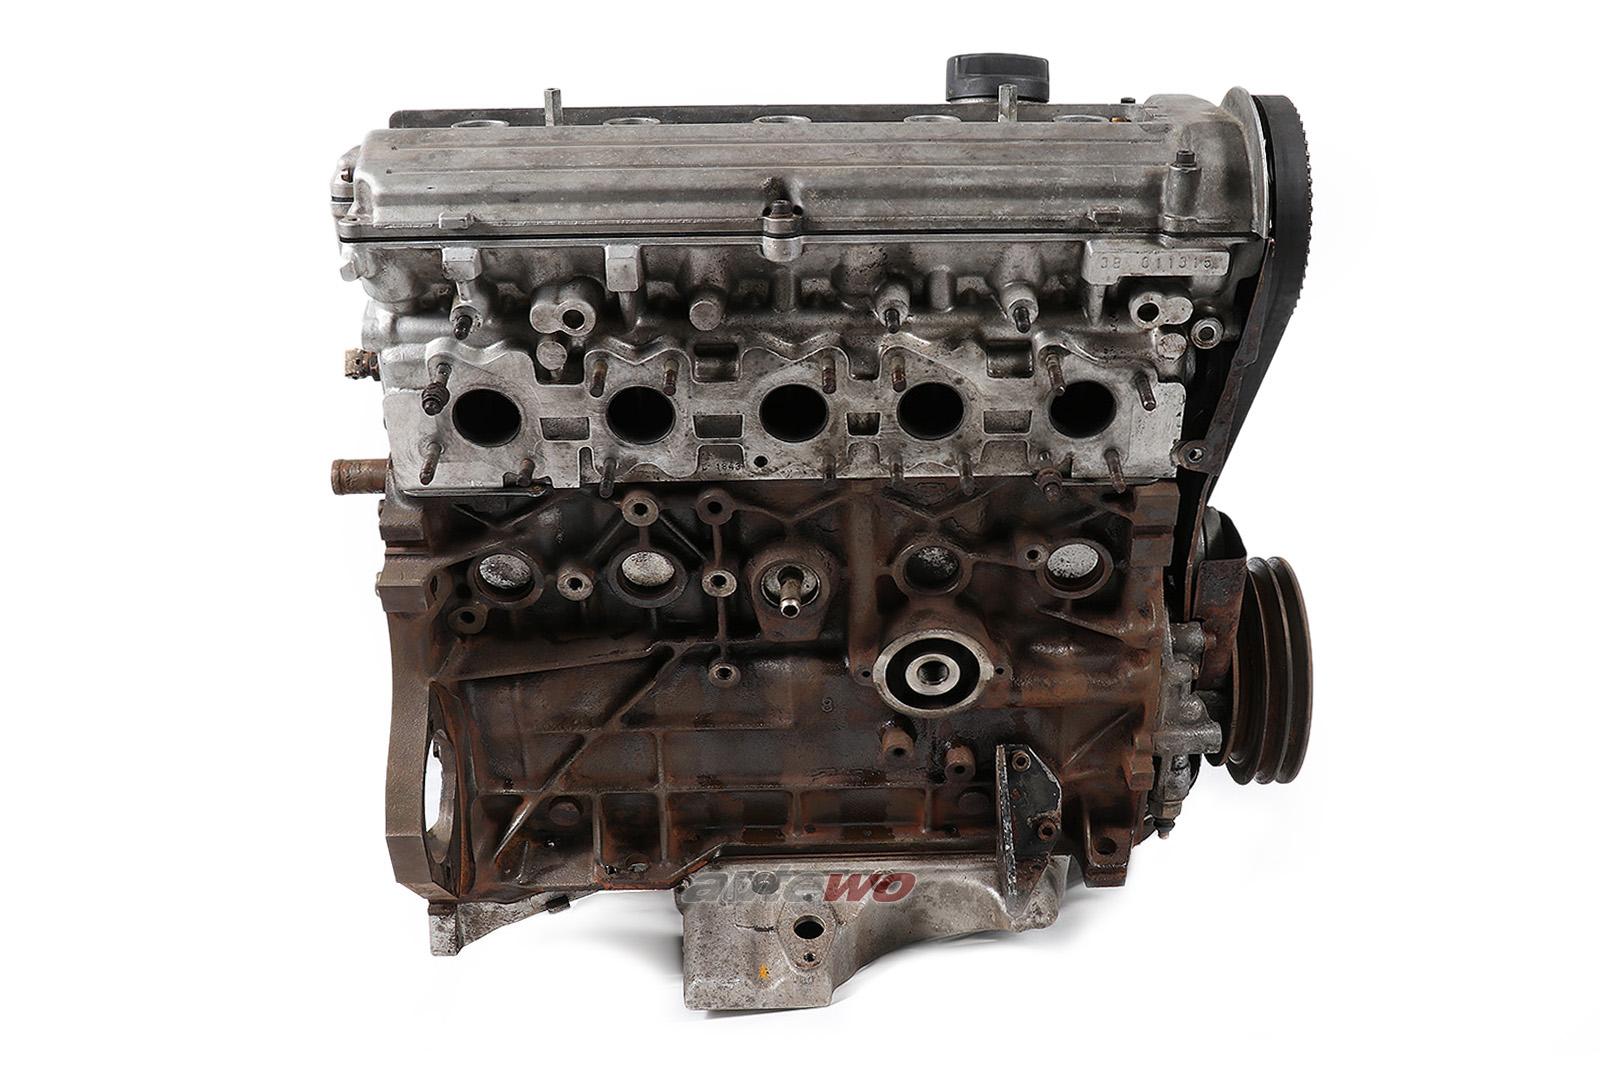 034100105D Audi 200/S2/Urquattro 5 Zylinder 20V Turbo 3B 011315 Rumpfmotor